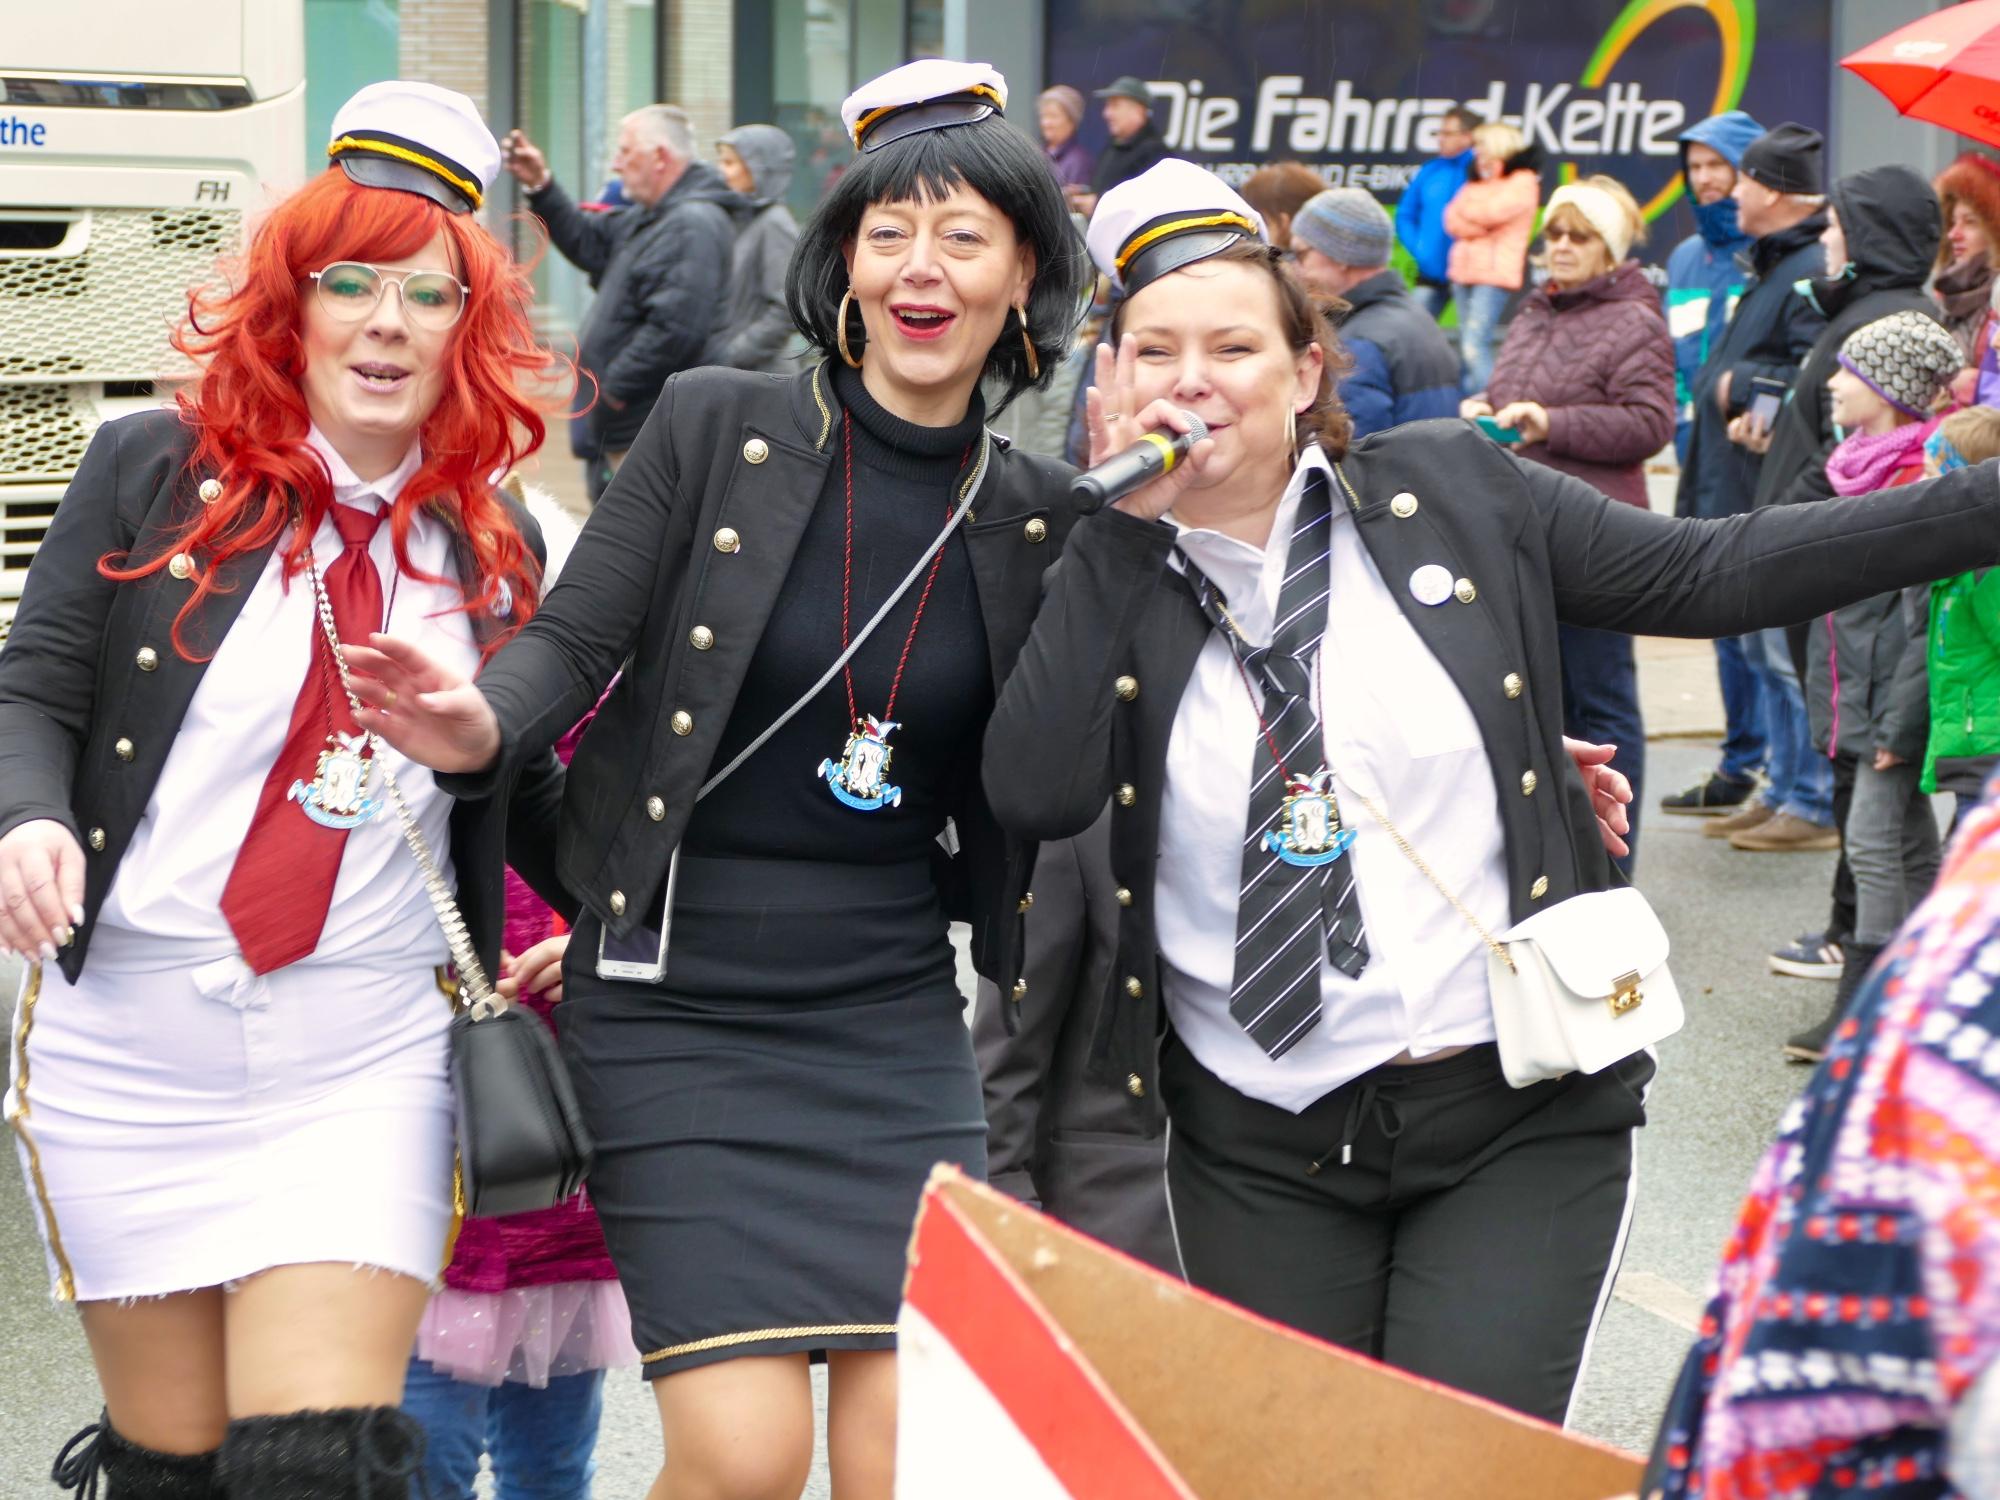 Karnevalsumzug-Freital-2020-Bild-15